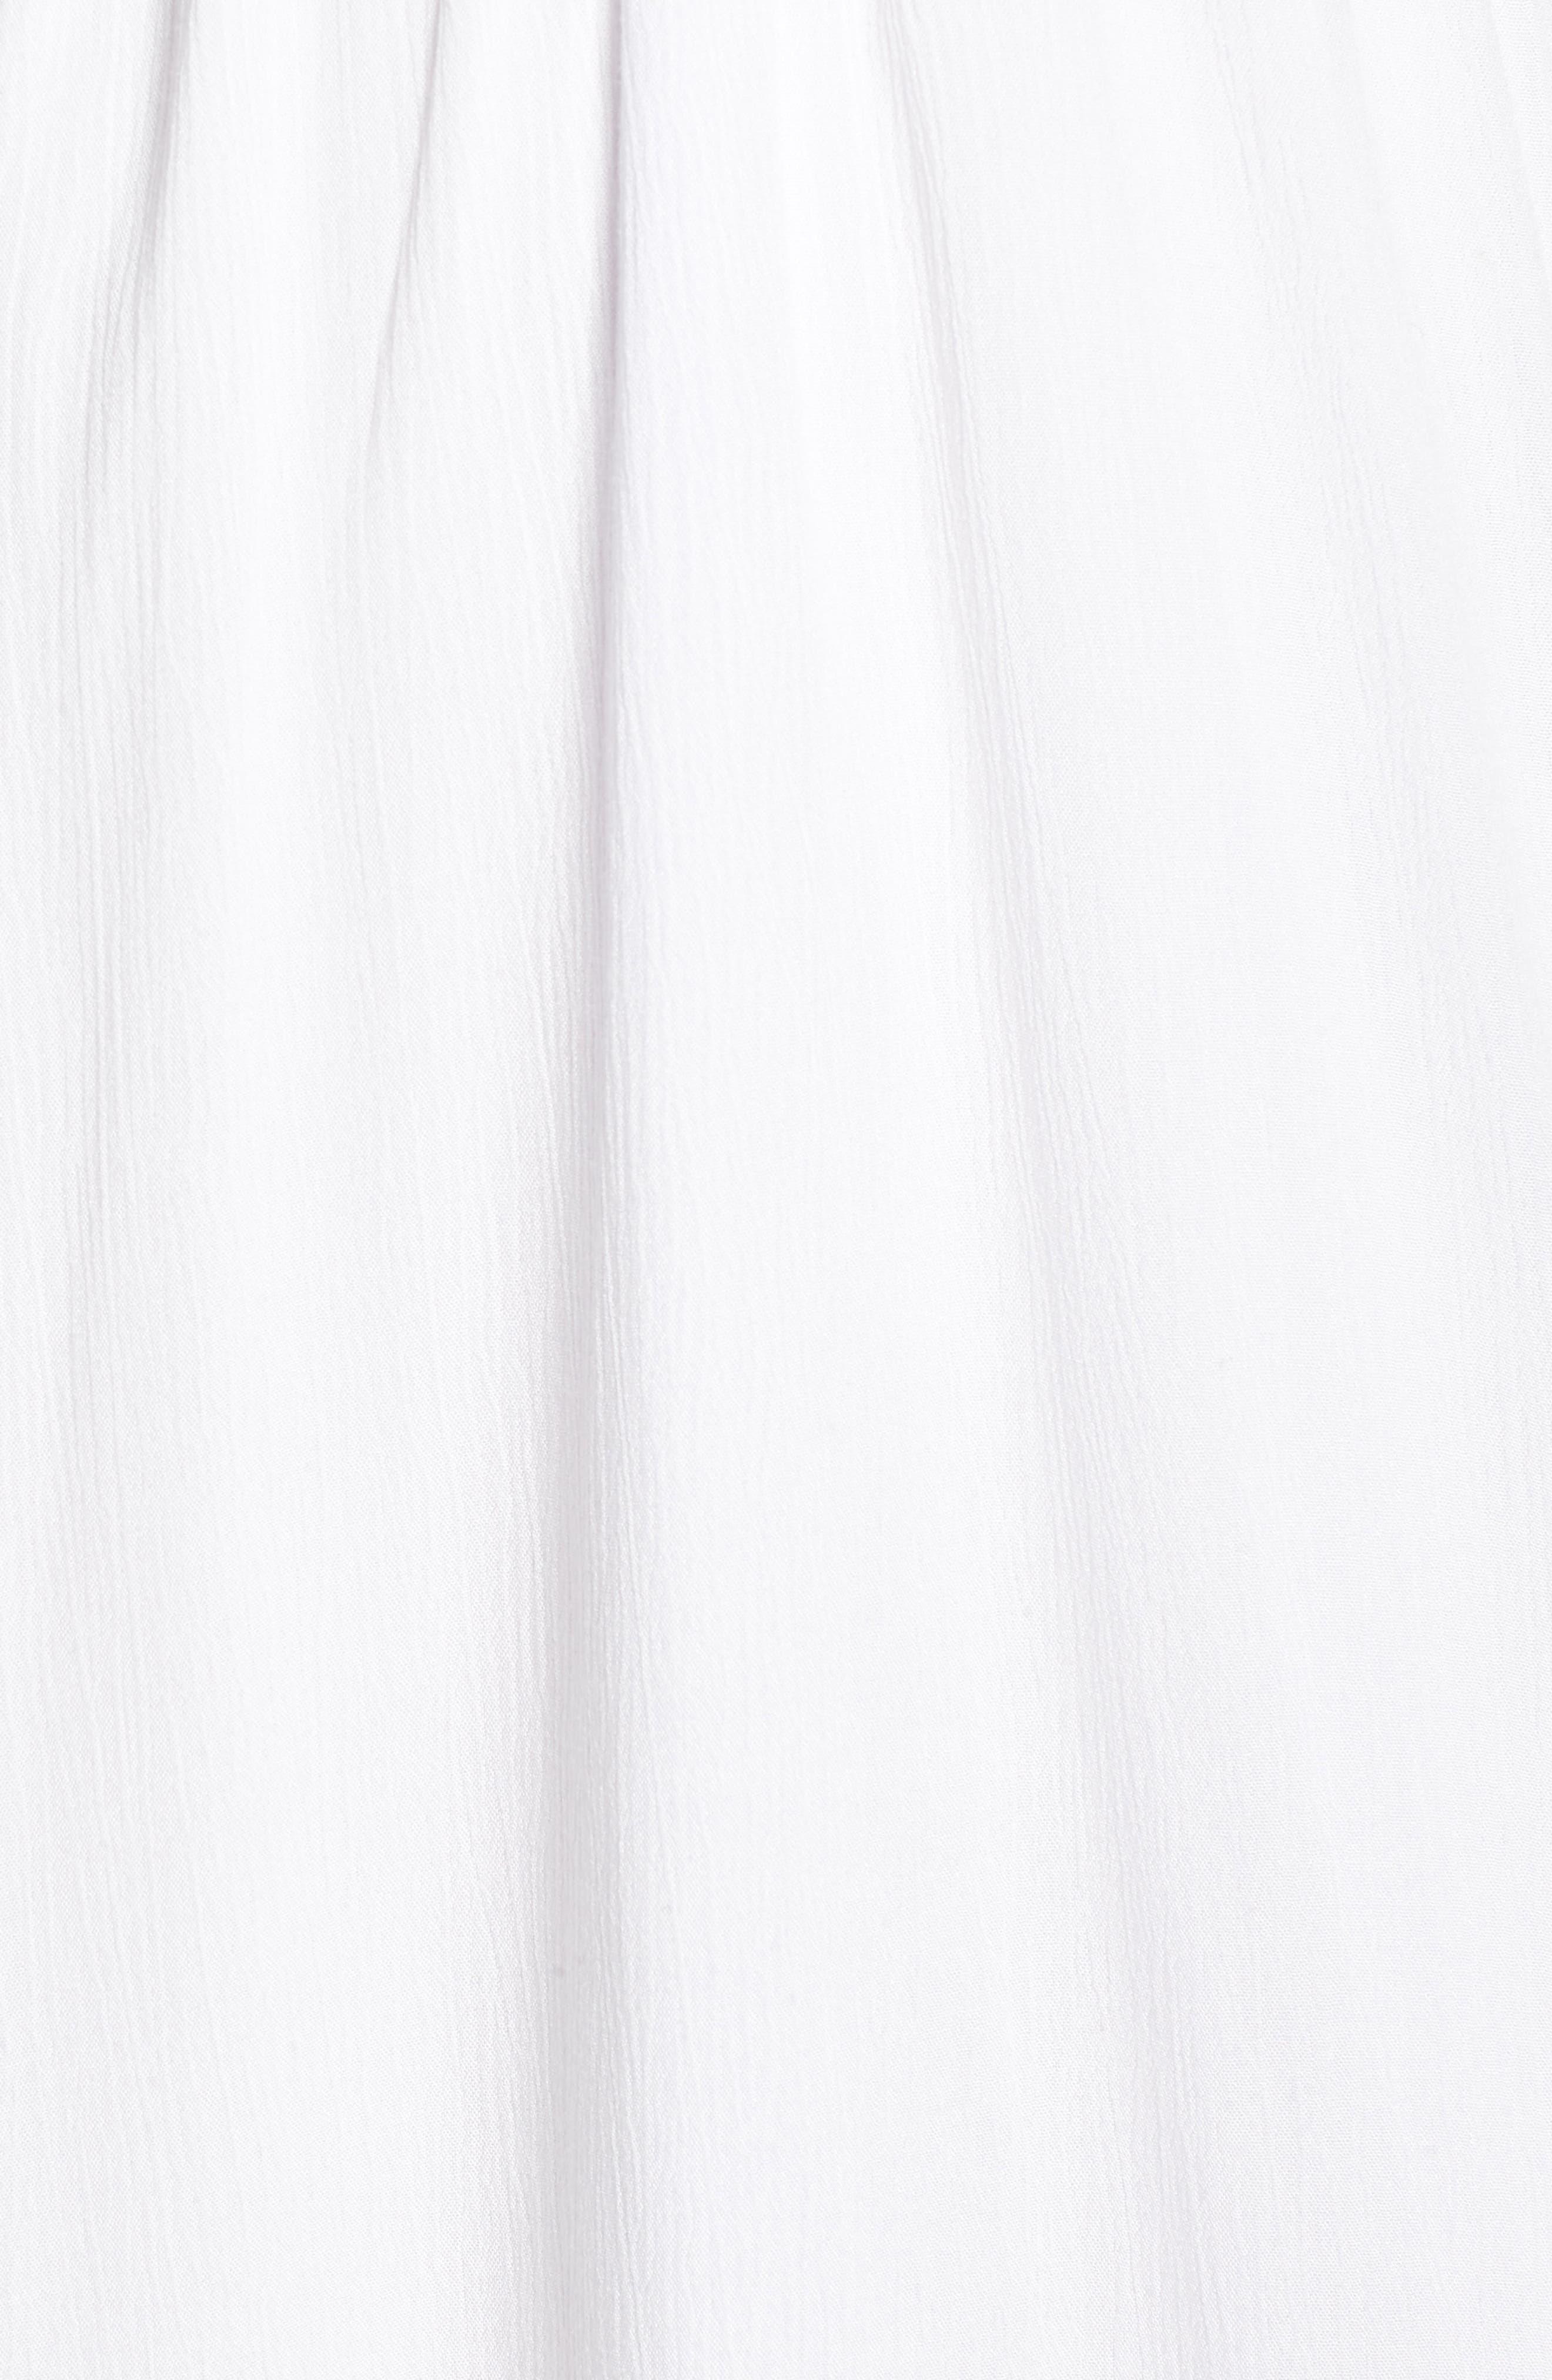 Babylon Cutout Dress,                             Alternate thumbnail 6, color,                             Ivory